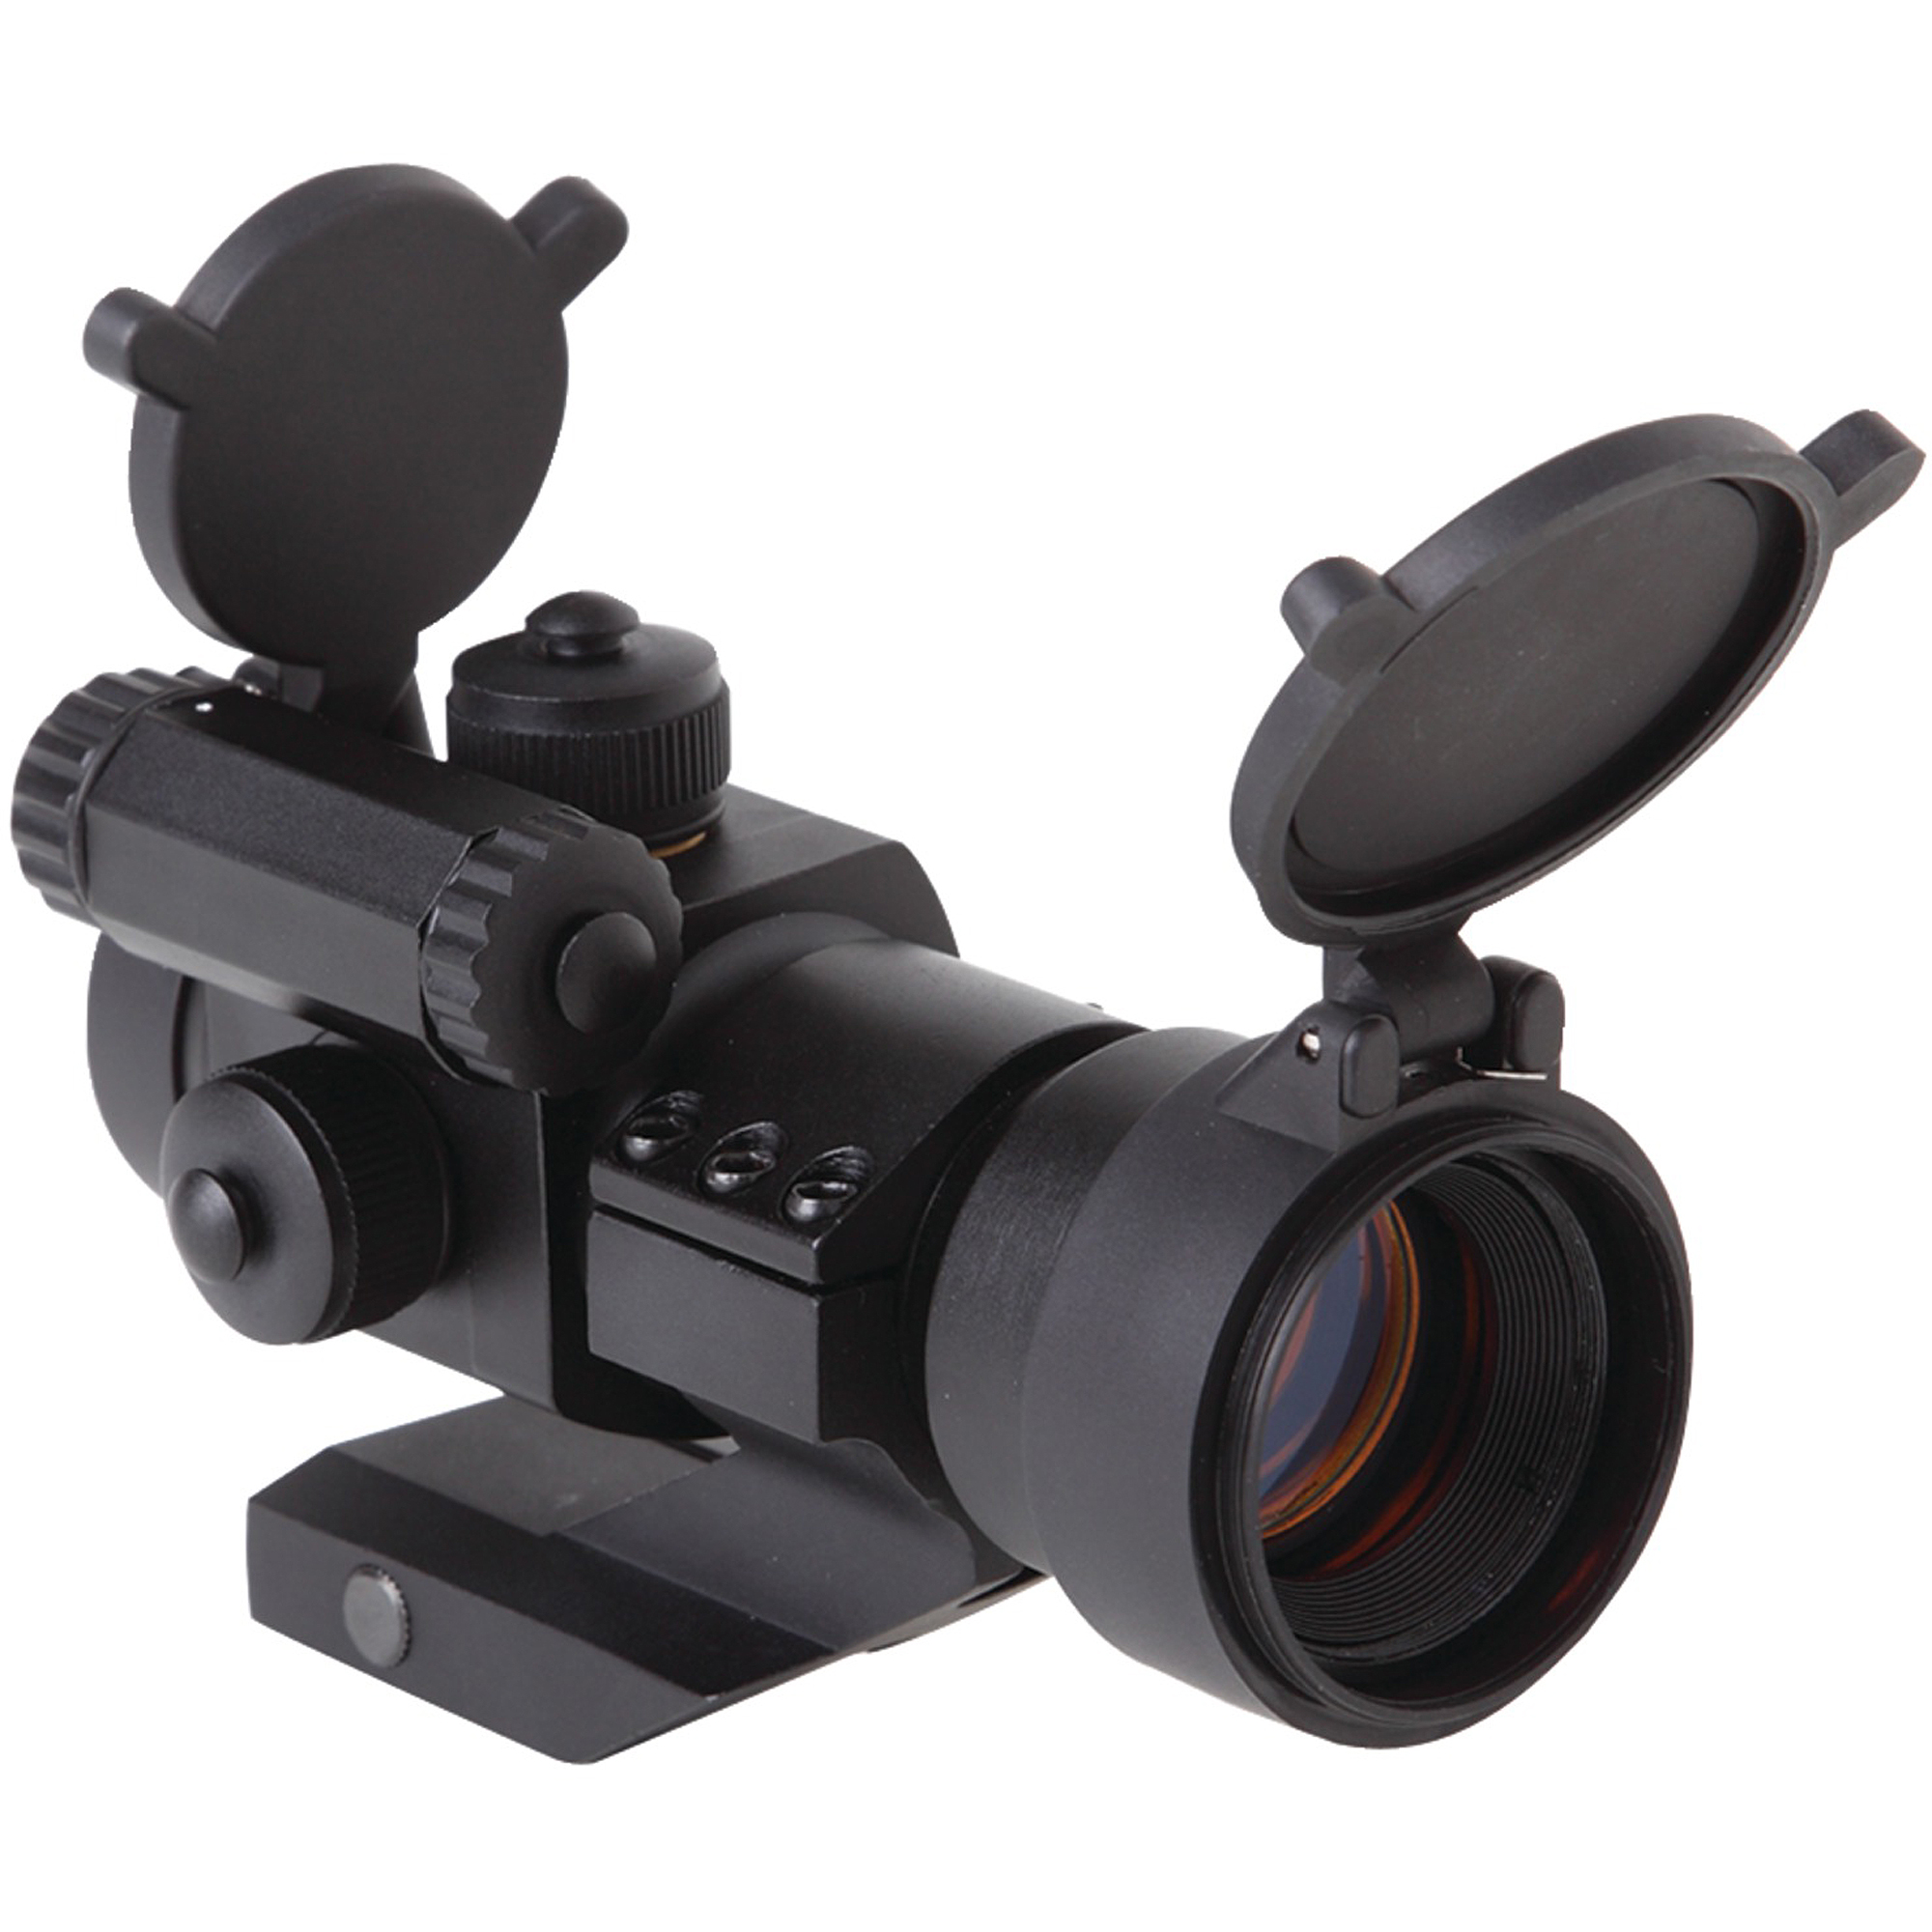 Firefield/Sightmark Close Combat Sight 1x Black, FF26002